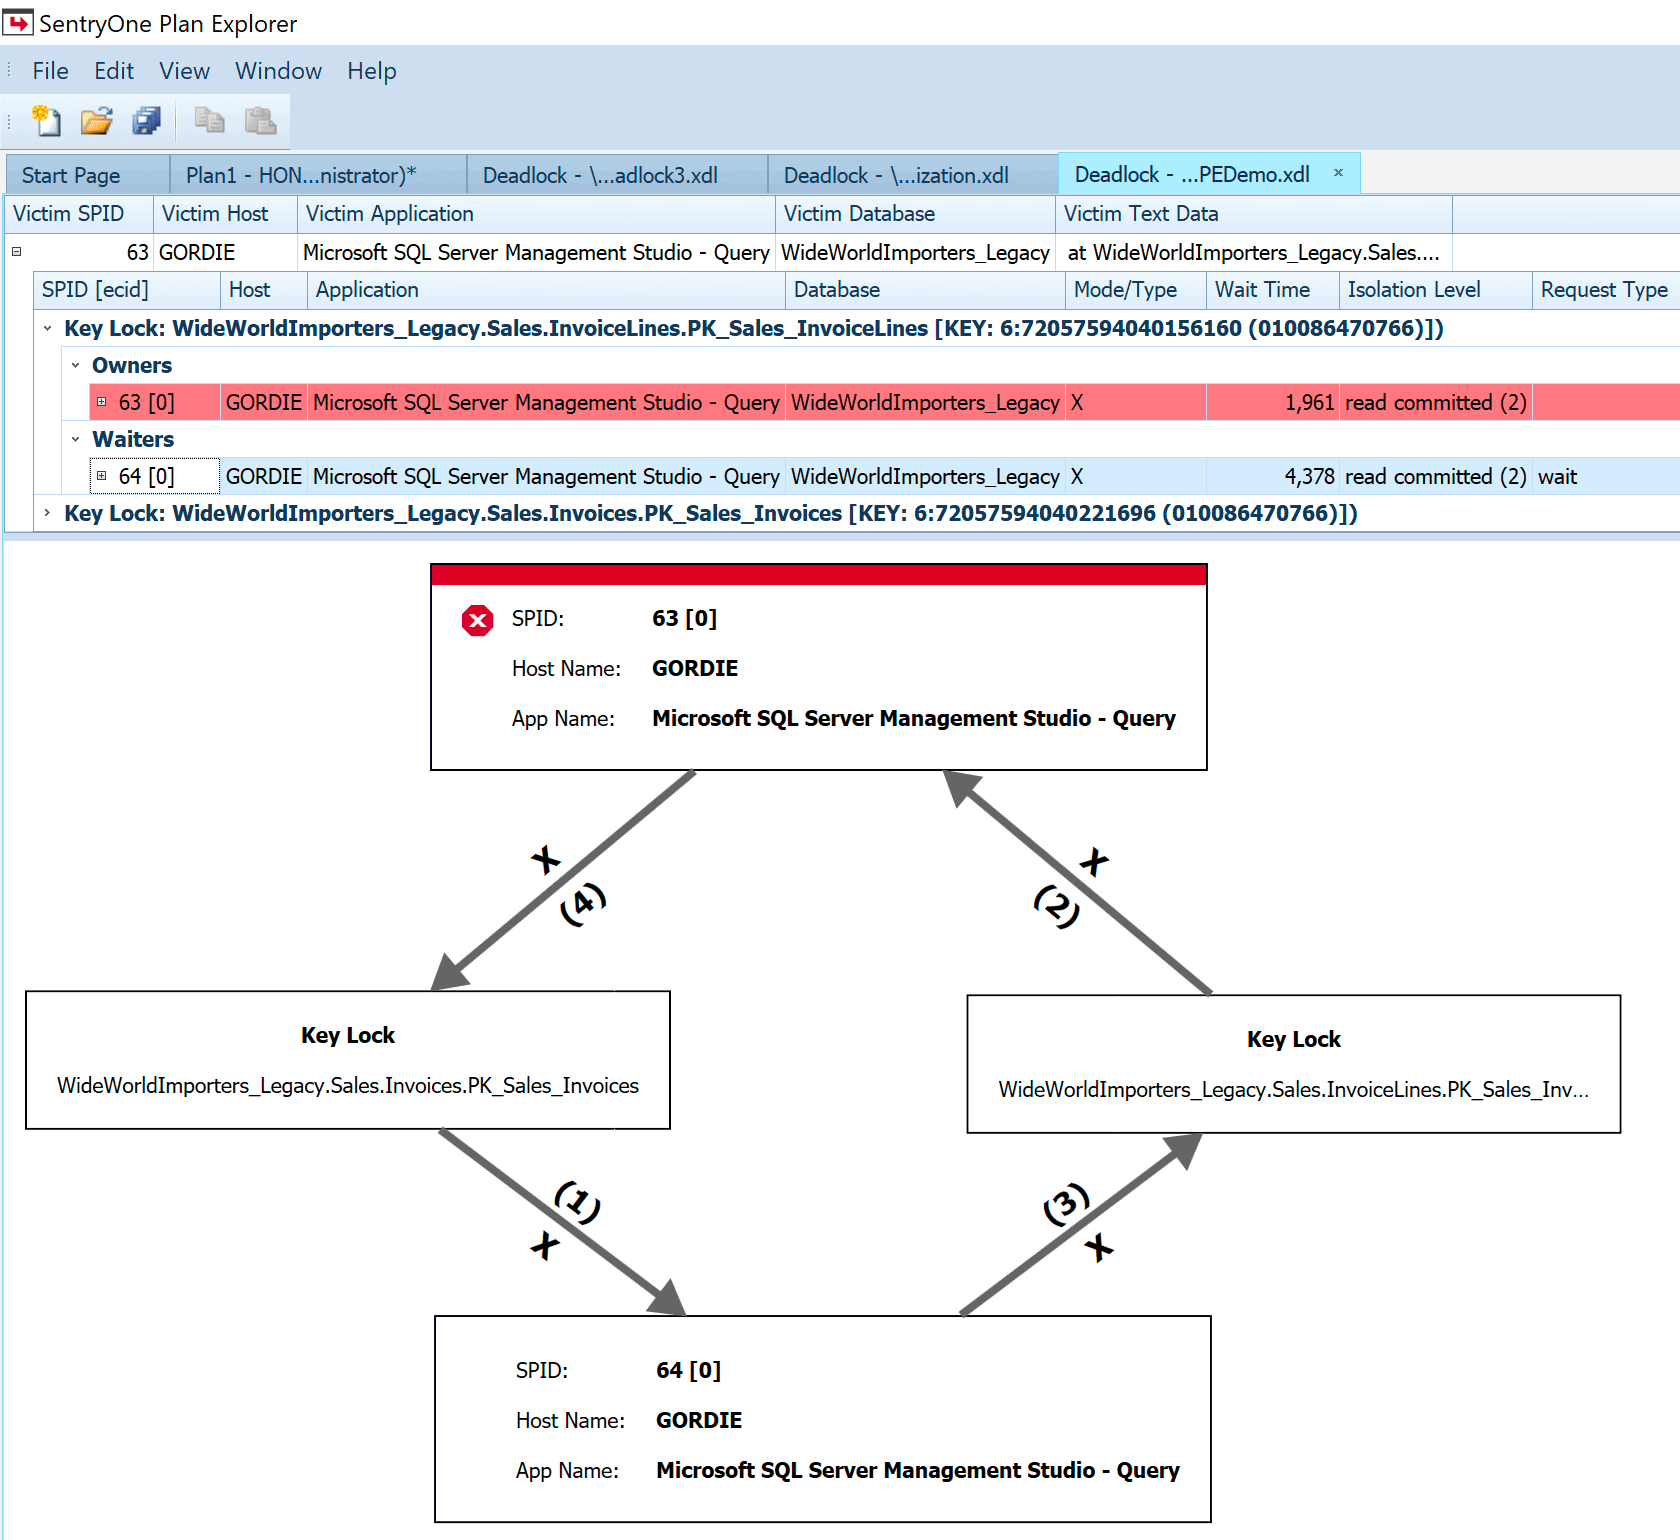 Updated SentryOne / Plan Explorer deadlock diagram (click to enlarge)